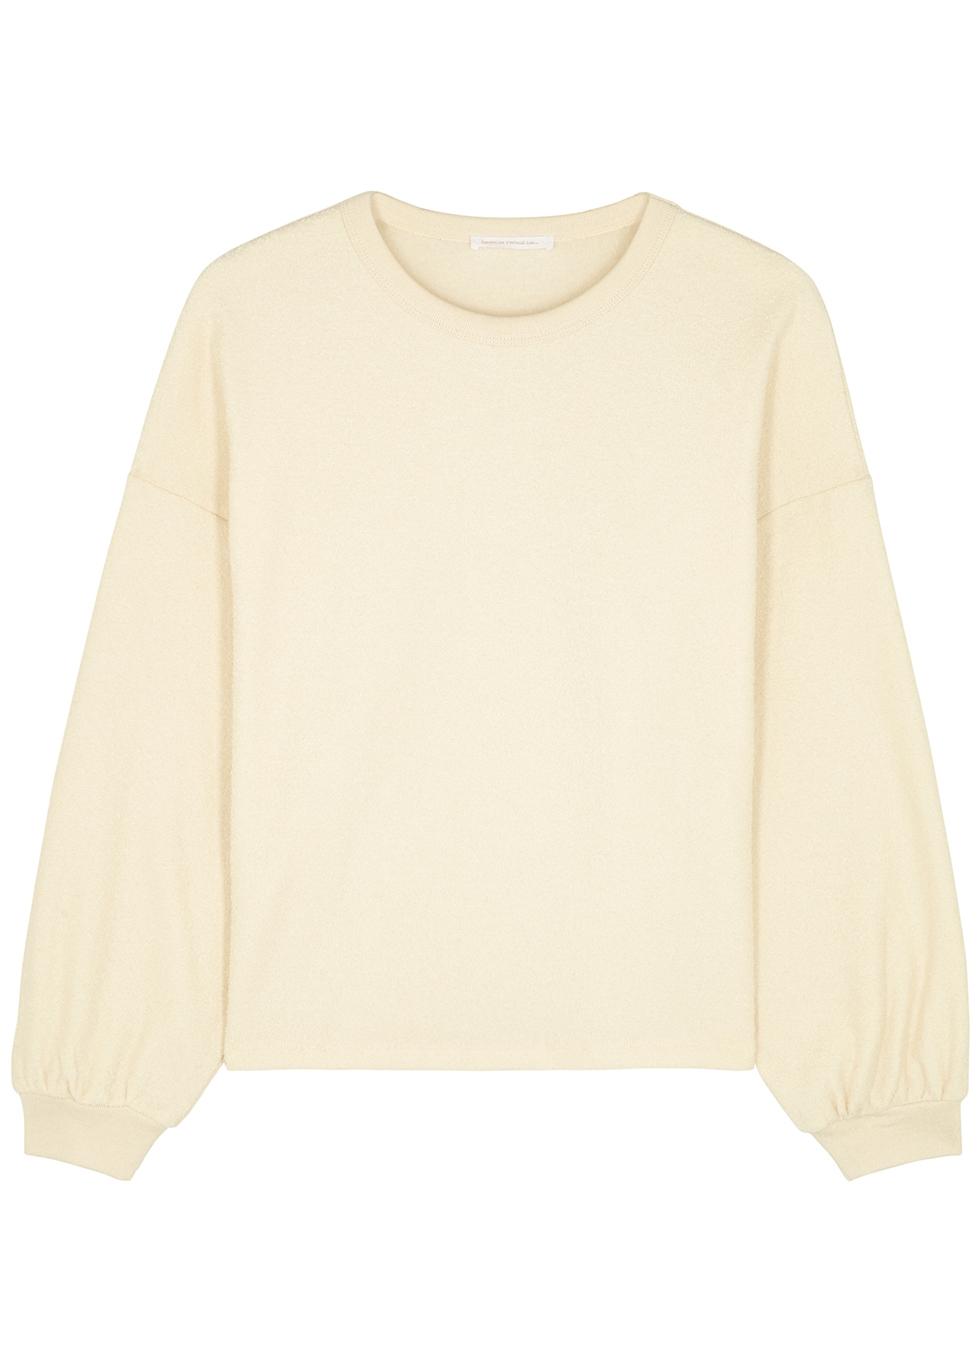 Bobypark off-white terry cotton sweatshirt